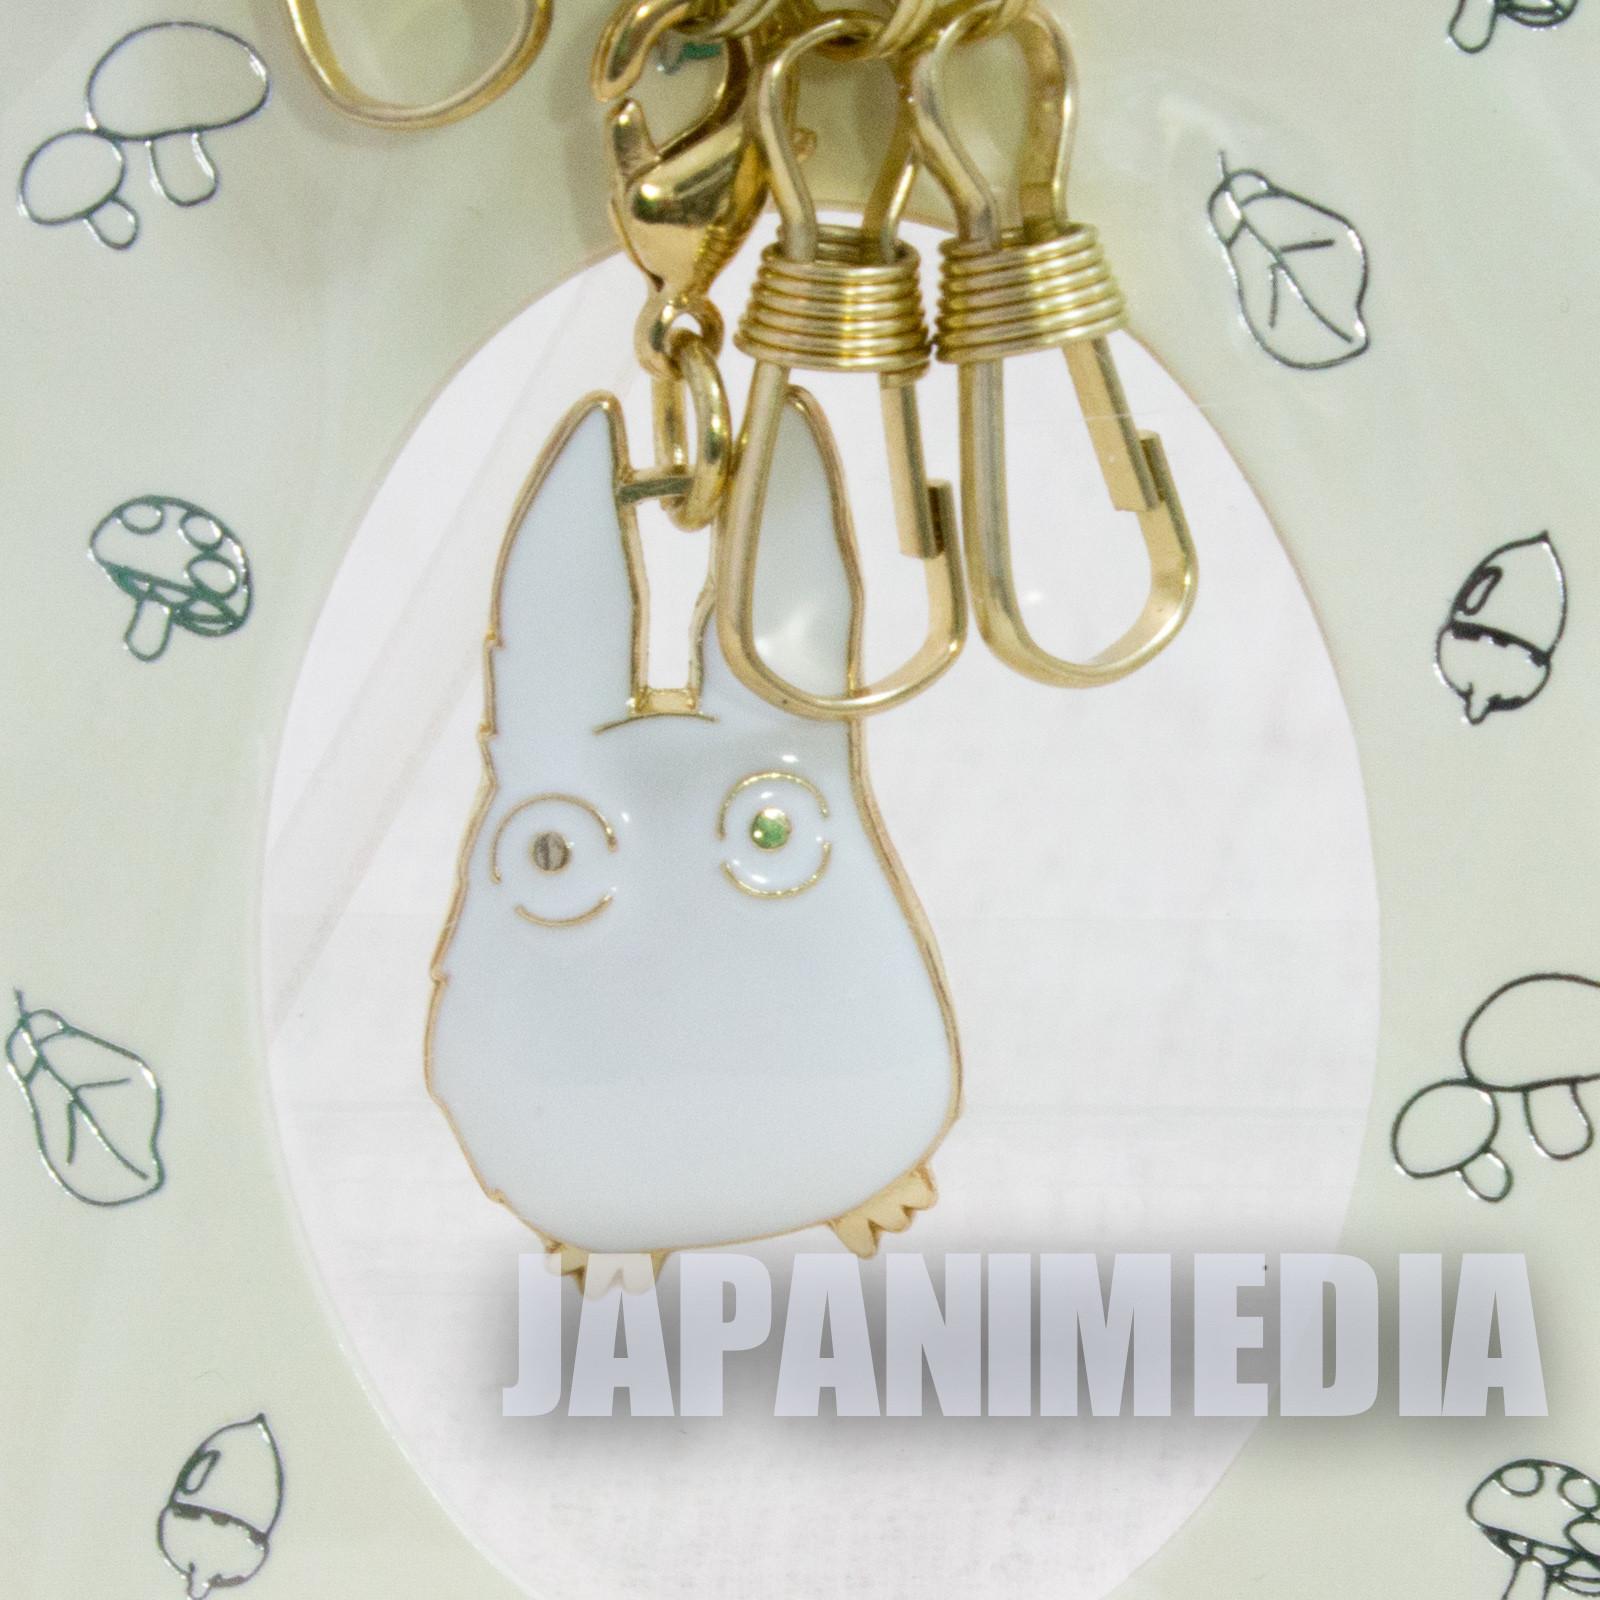 My Neighbor Totoro Mascot Charm Key Ring #4 Ghibli Hayao Miyazaki JAPAN